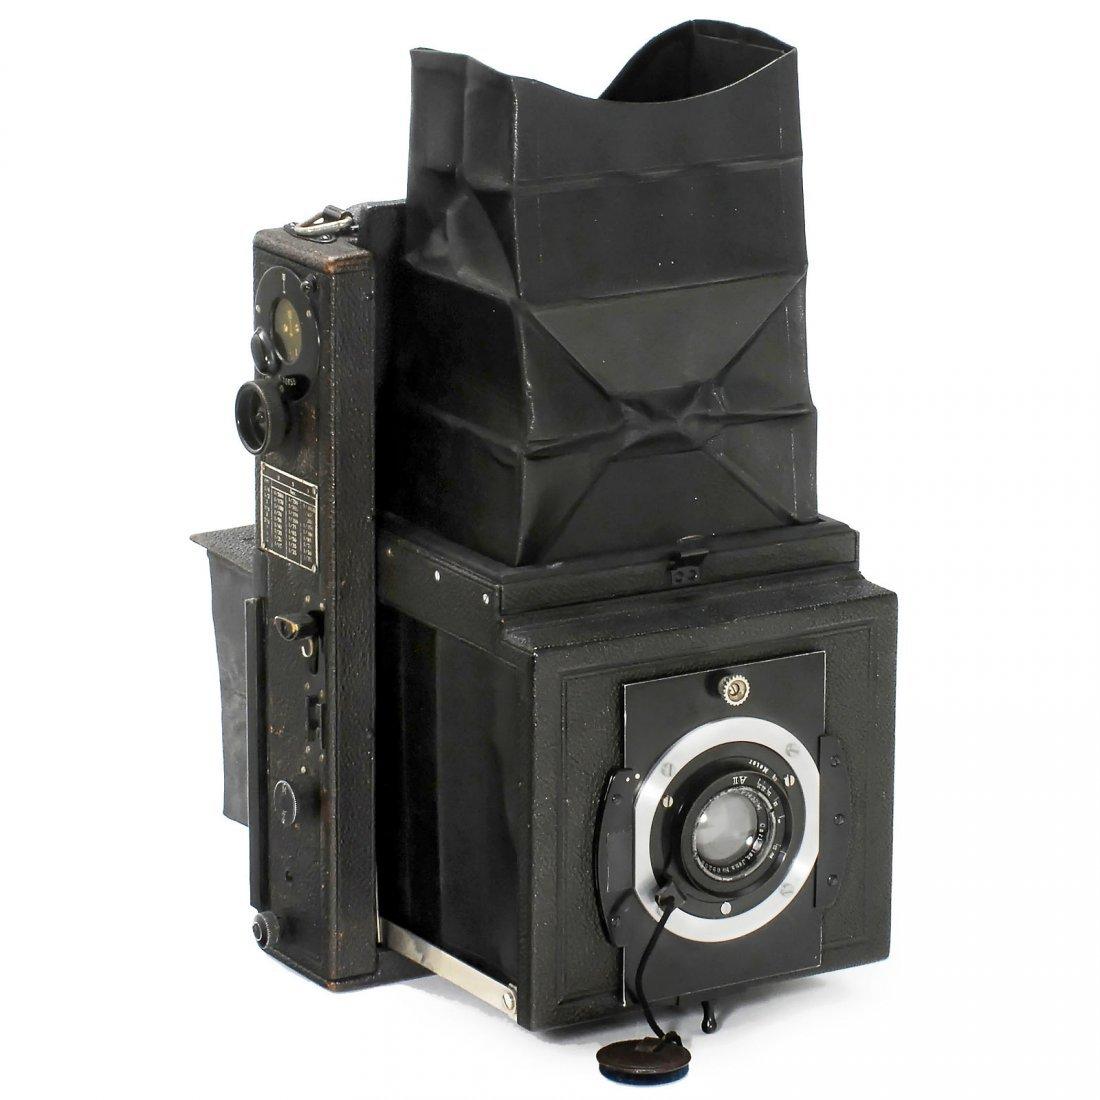 Ica-Reflex 755 (Künstler-Camera), c. 1924